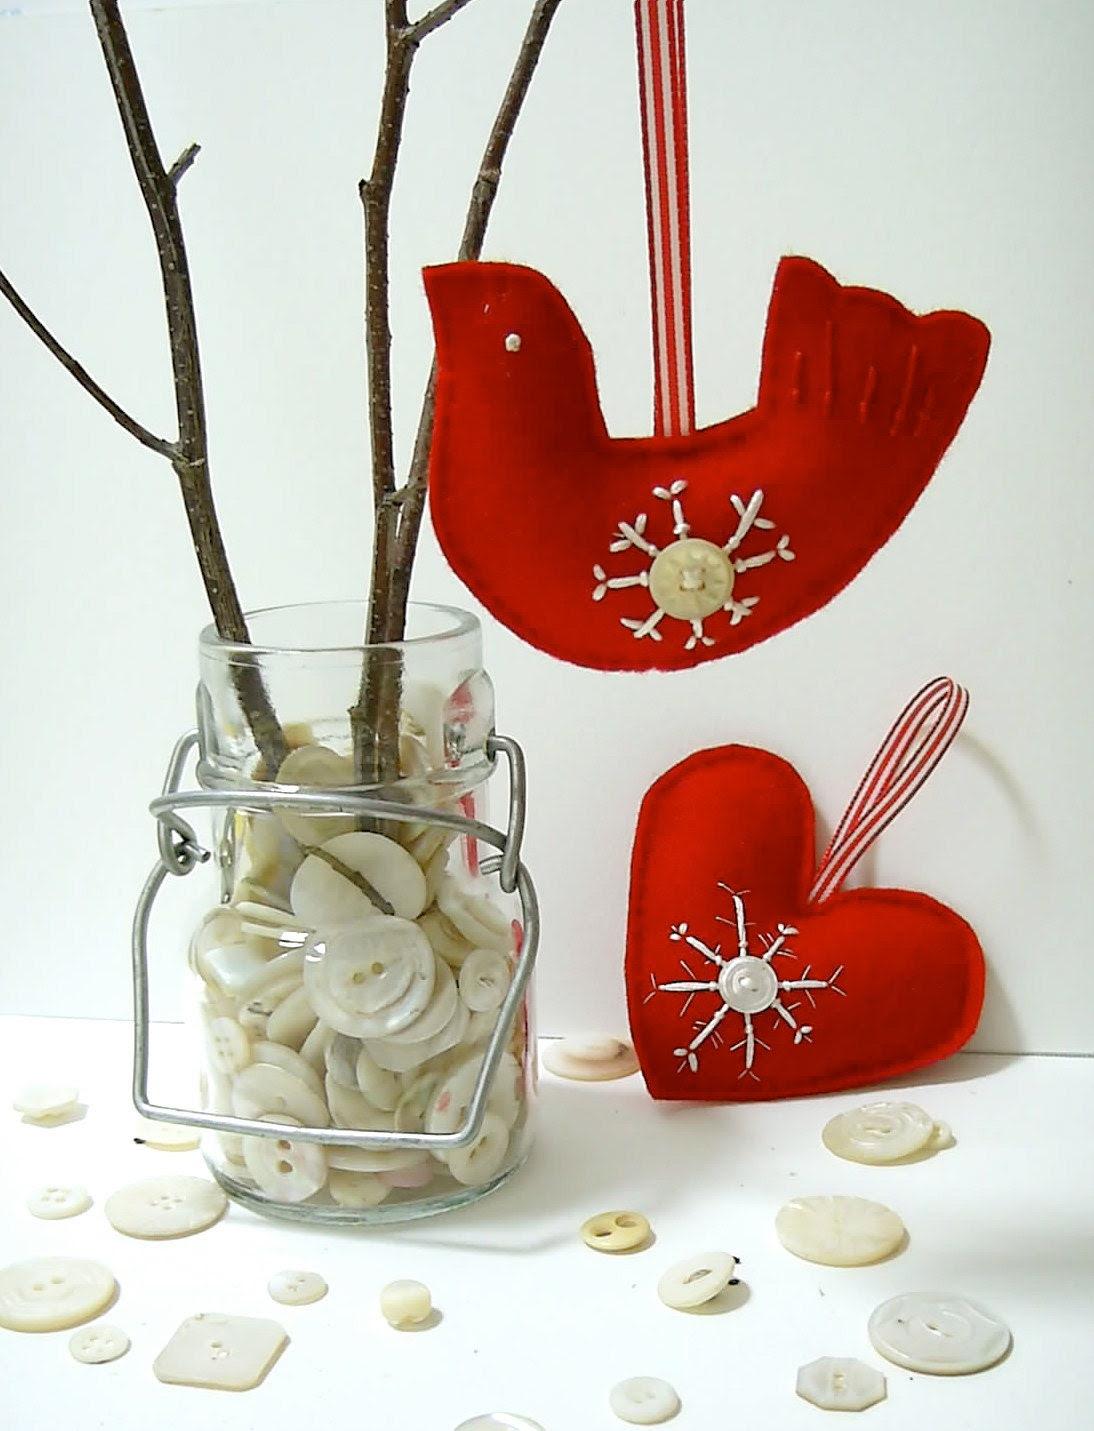 Christmas tree ornaments red felt bird & heart by BirdintheWoods